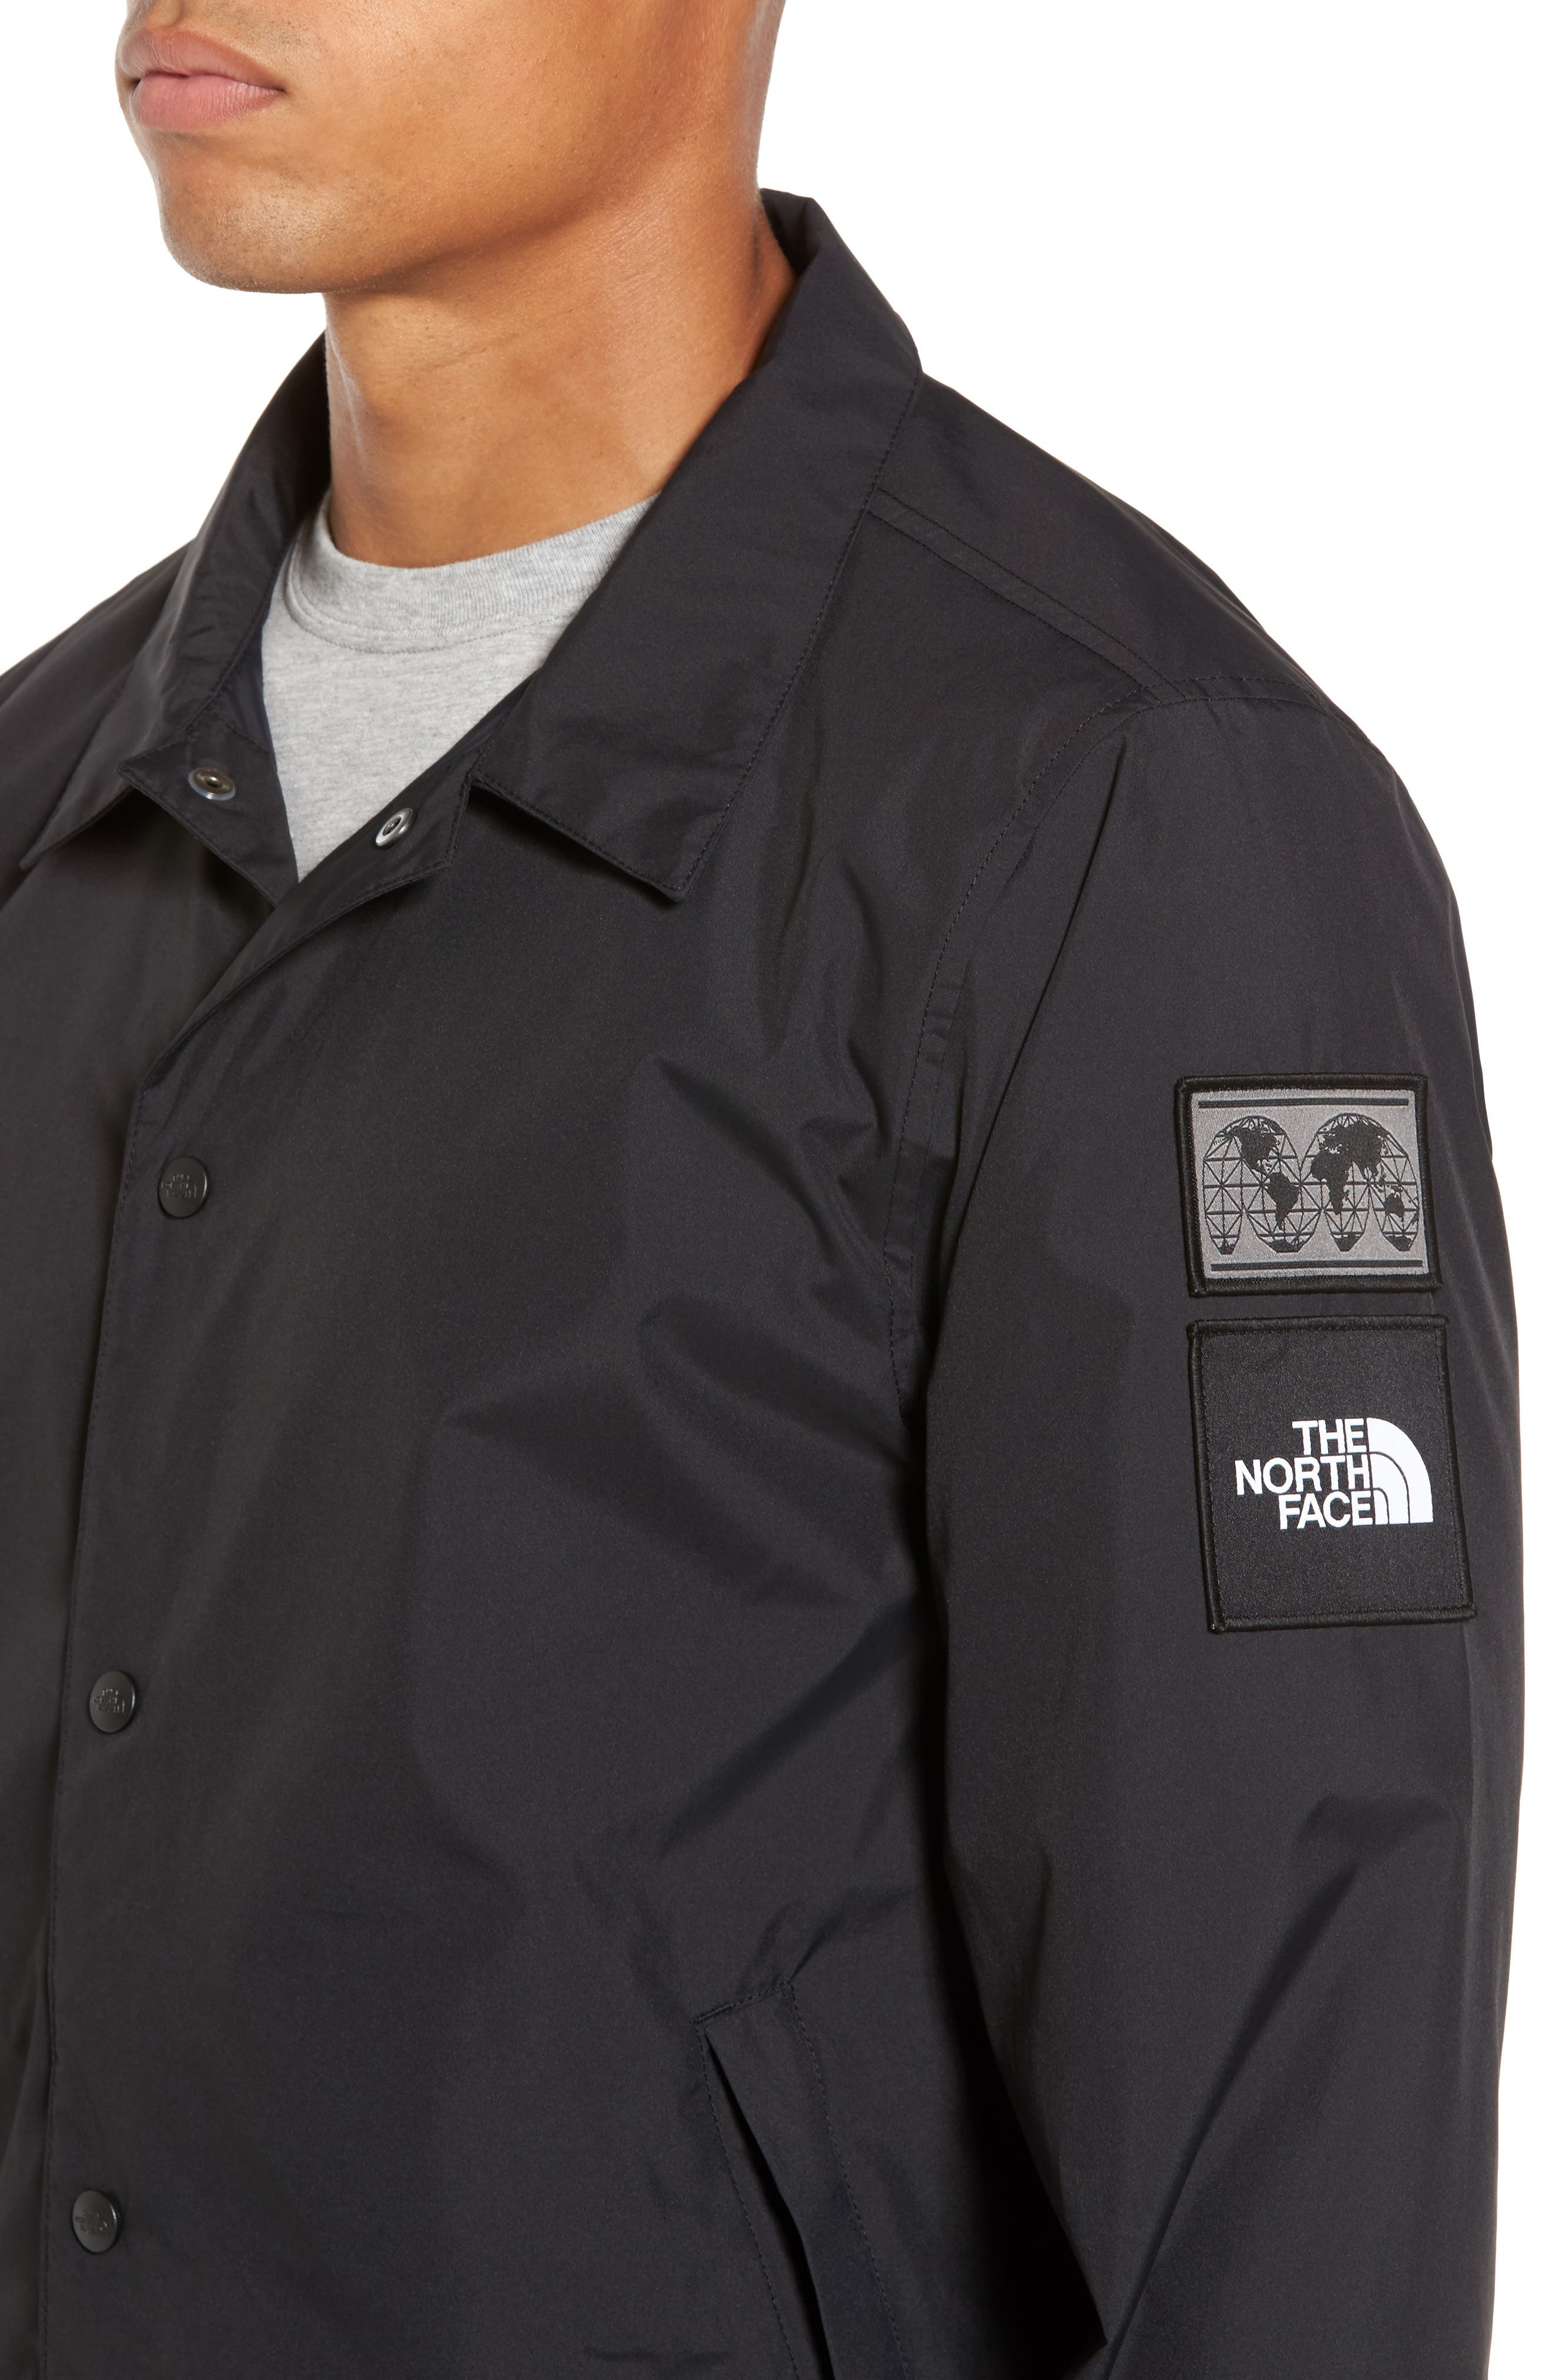 International Collection Coach Jacket,                             Alternate thumbnail 10, color,